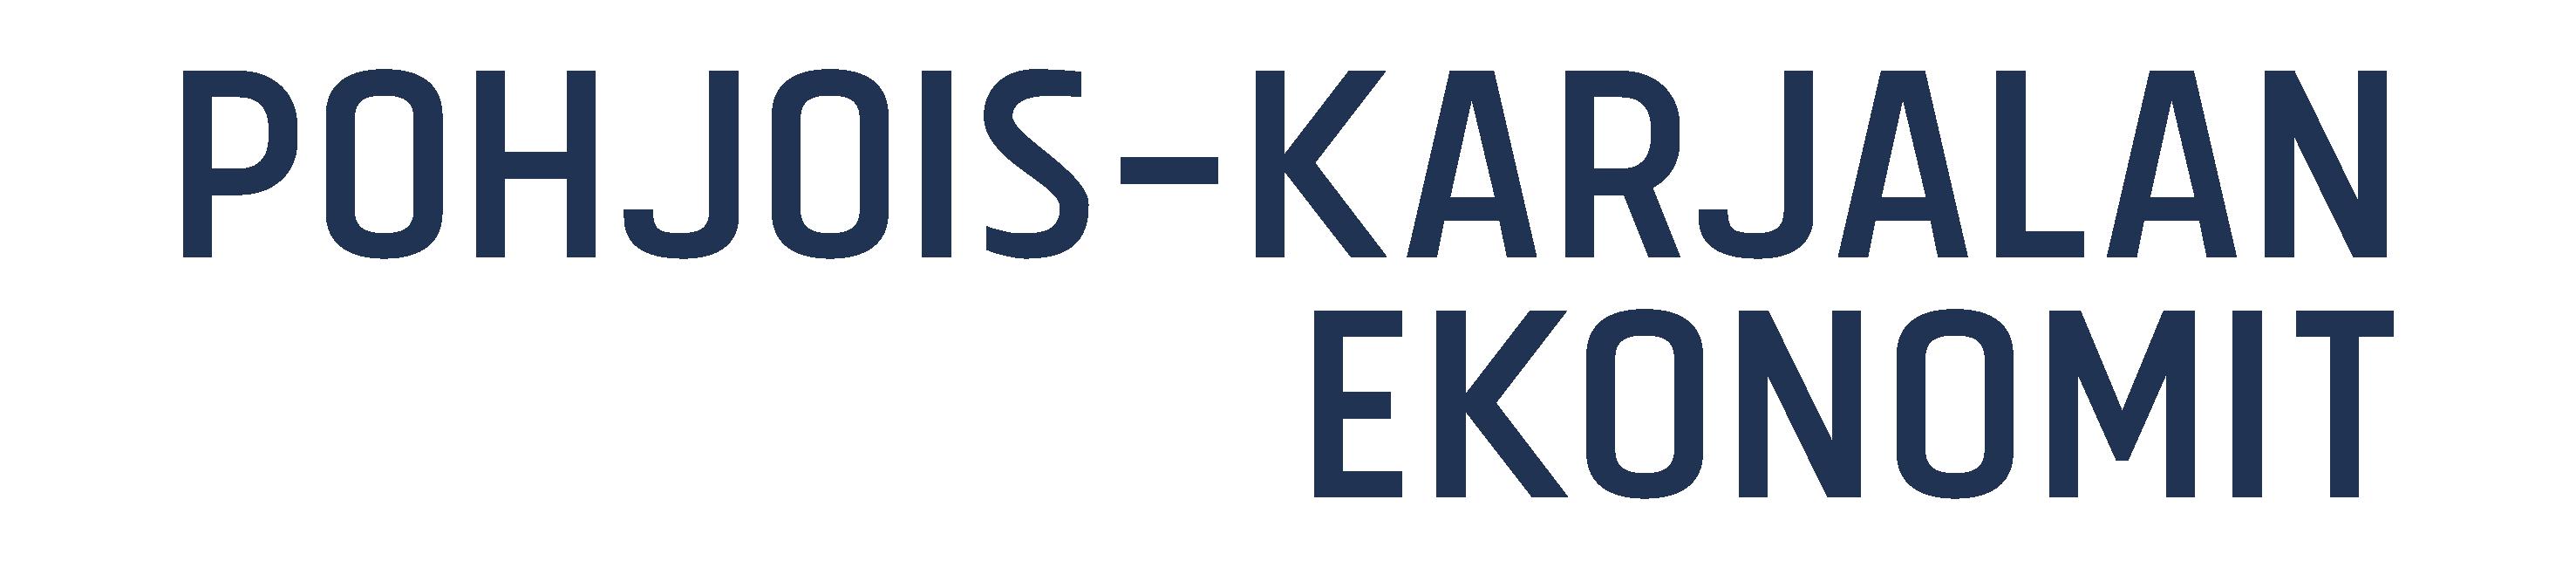 Pohjois-Karjalan Ekonomit